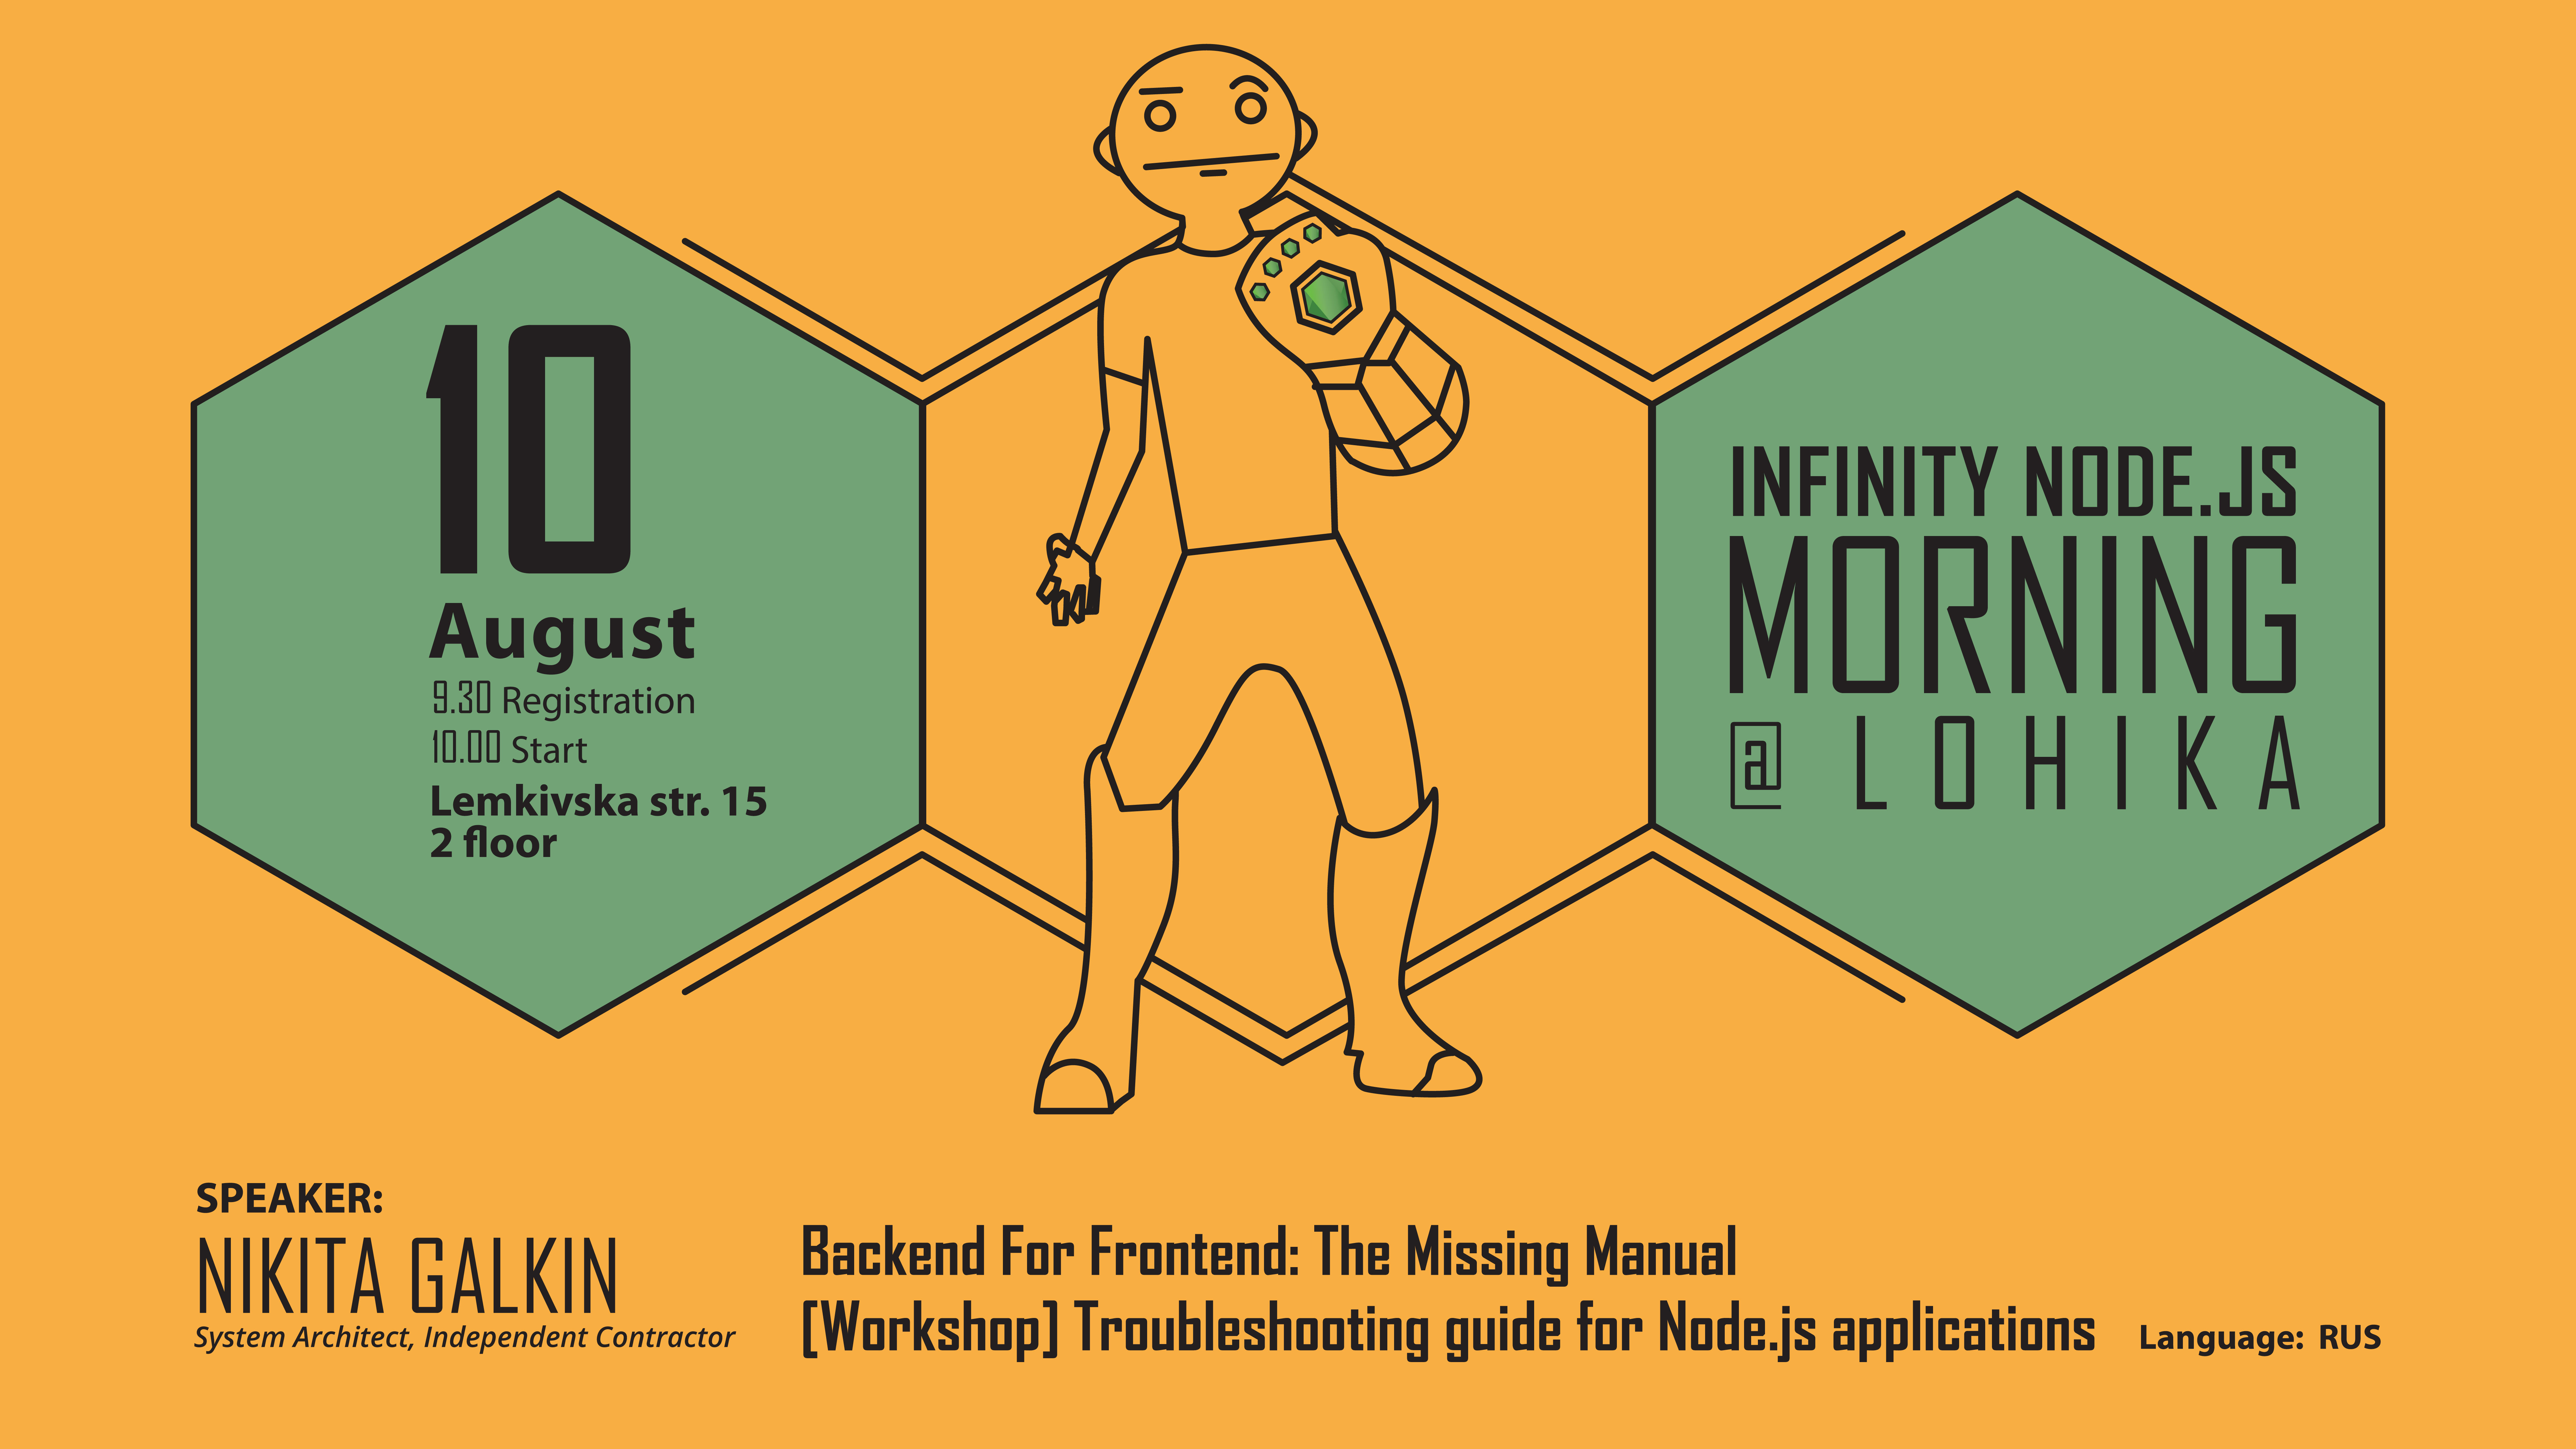 Infinity Node.js Morning@Lohika, 10